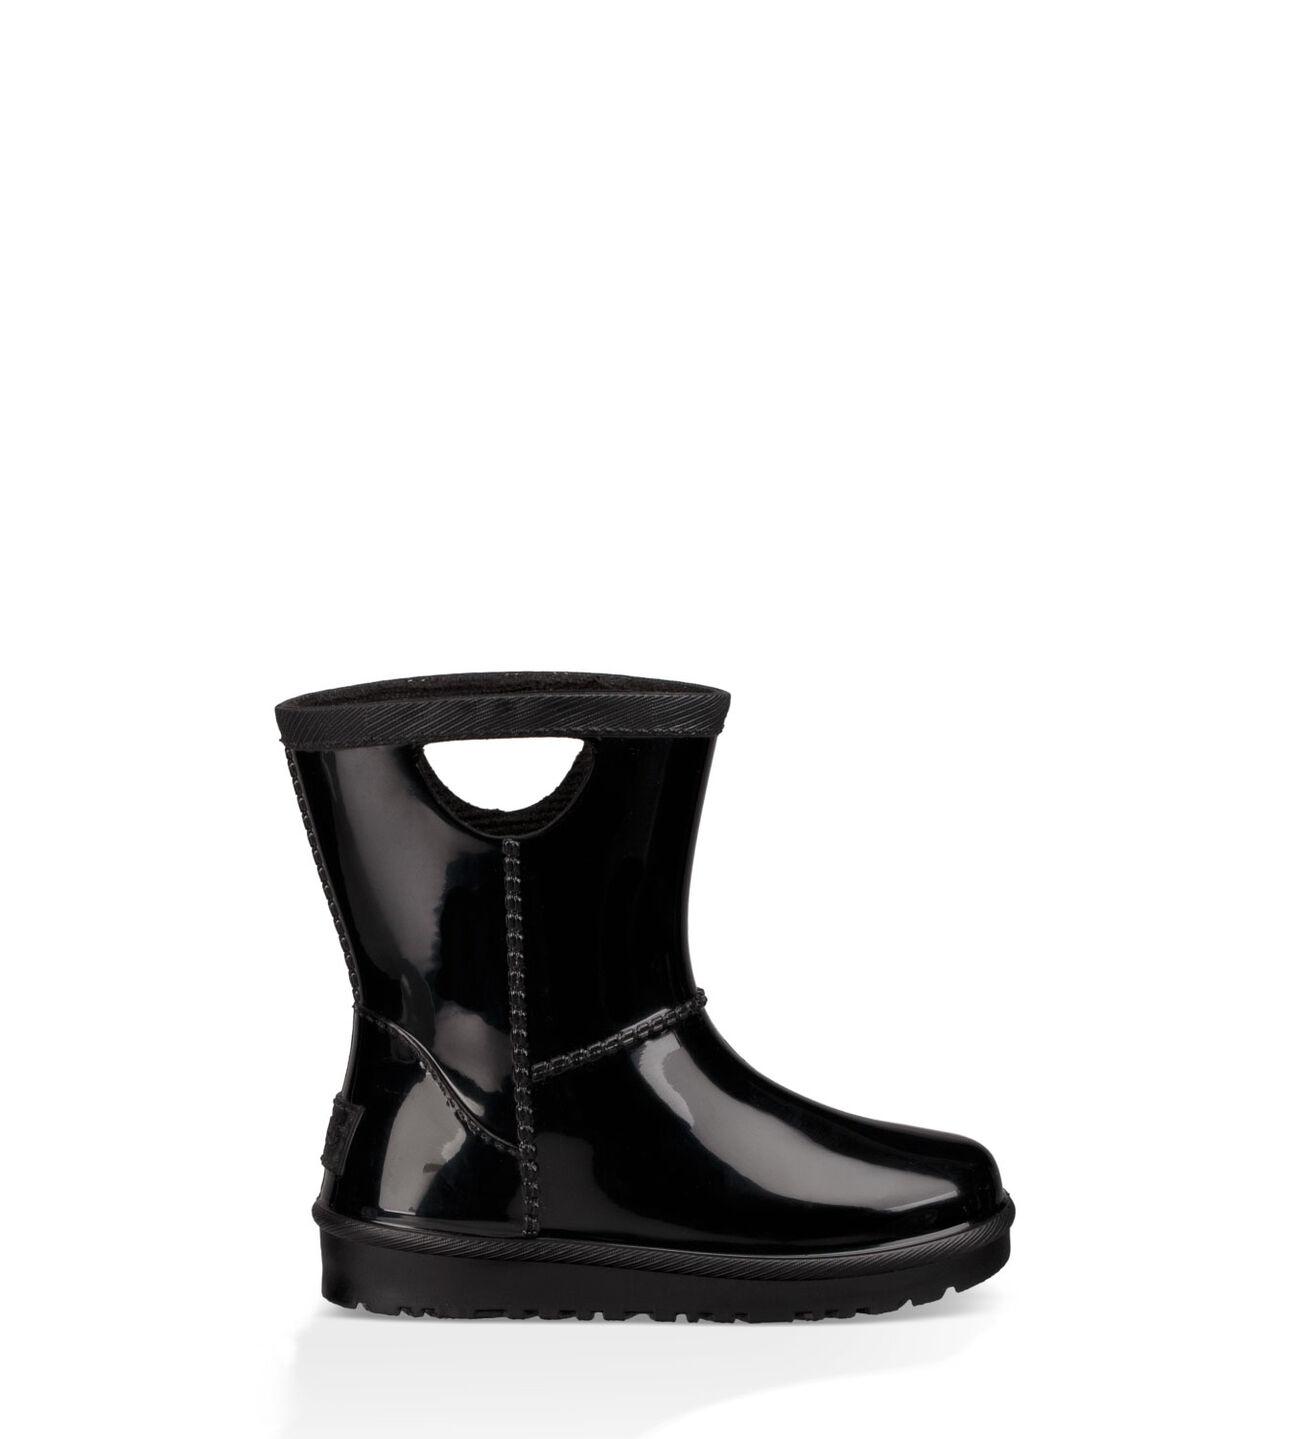 91cf902d09c Rahjee Rain Boot